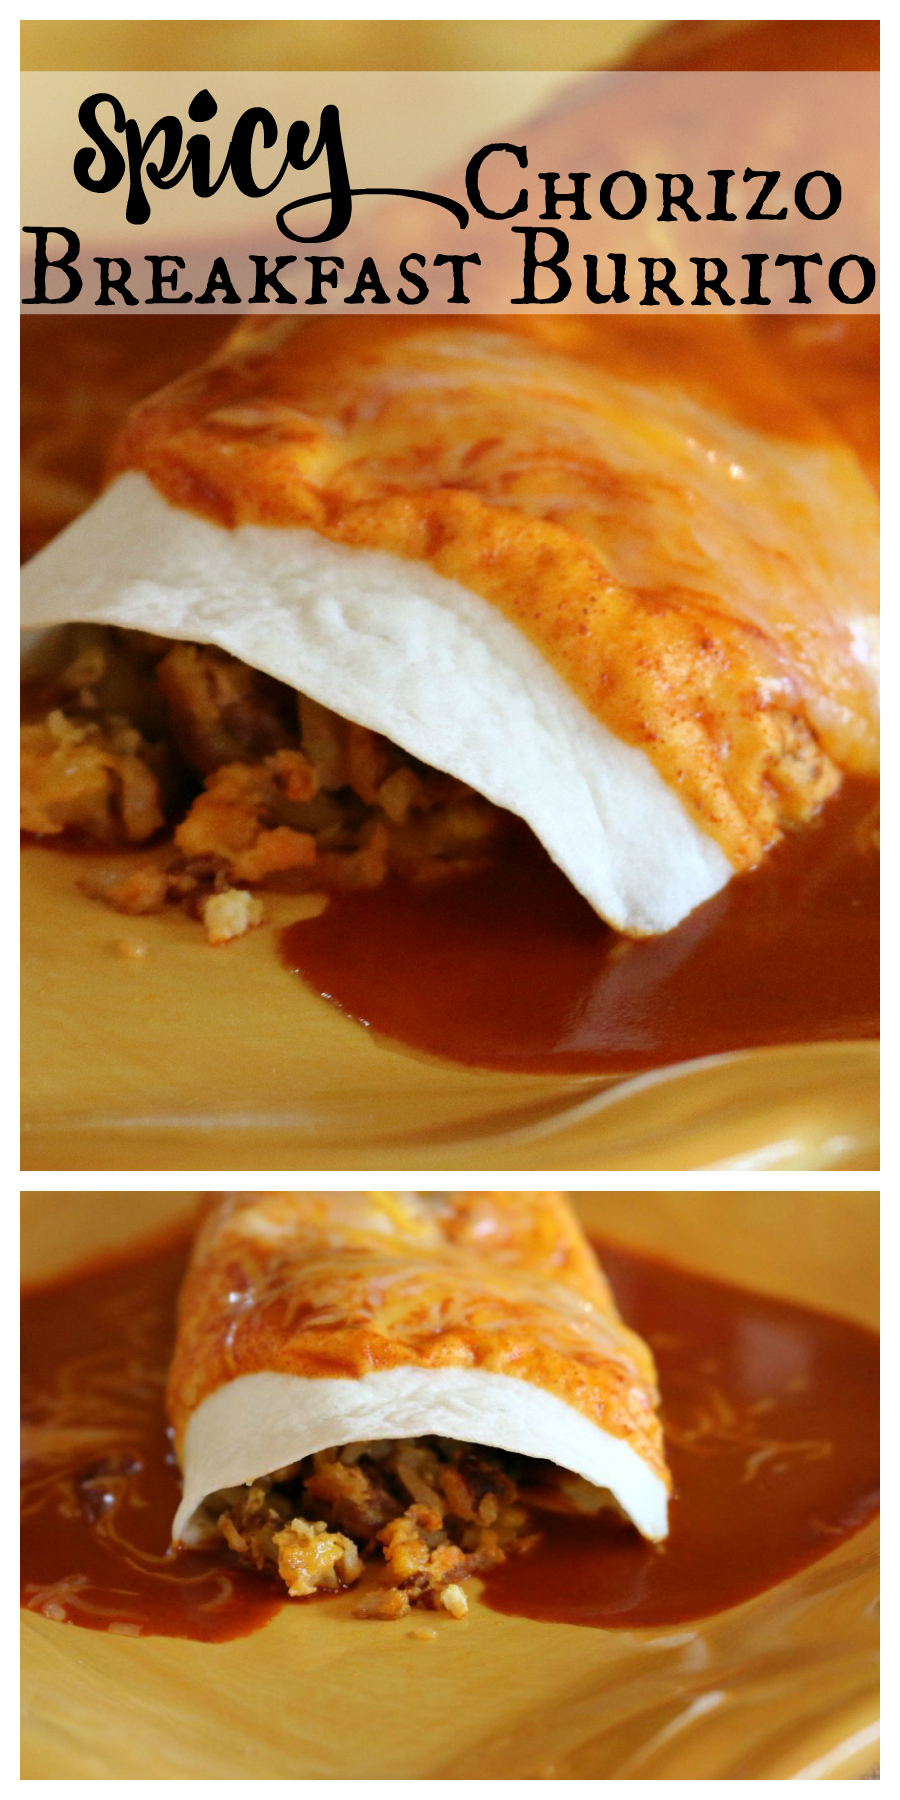 Spicy Chorizo Breakfast Burrito Recipe CeceliasGoodStuff.com Good Food for Good People